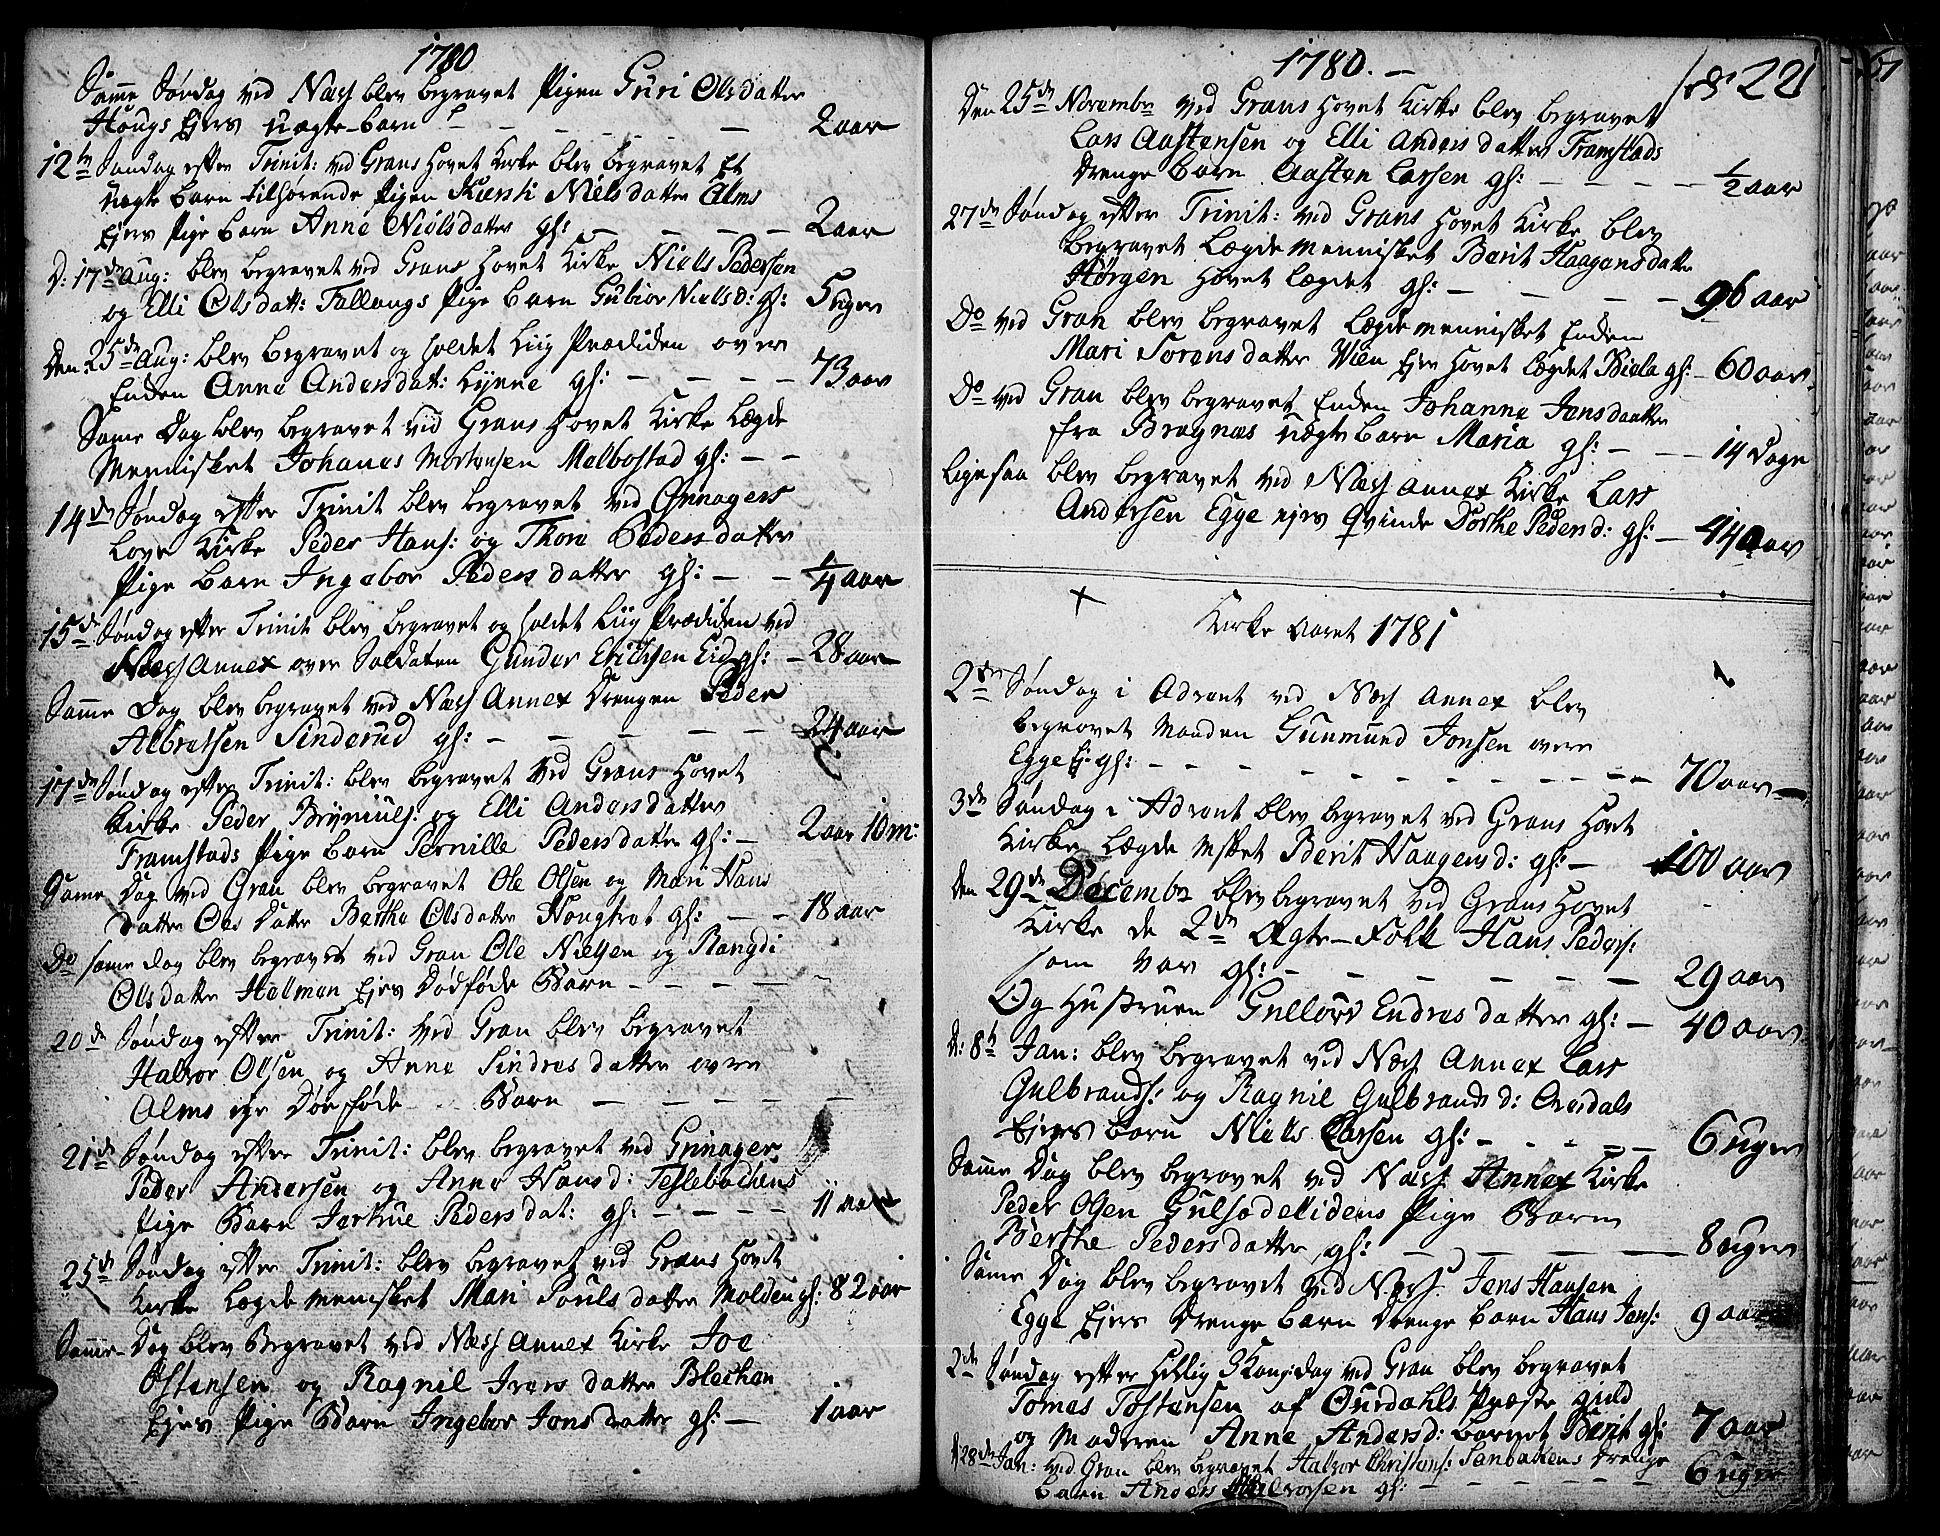 SAH, Gran prestekontor, Ministerialbok nr. 5, 1776-1788, s. 221